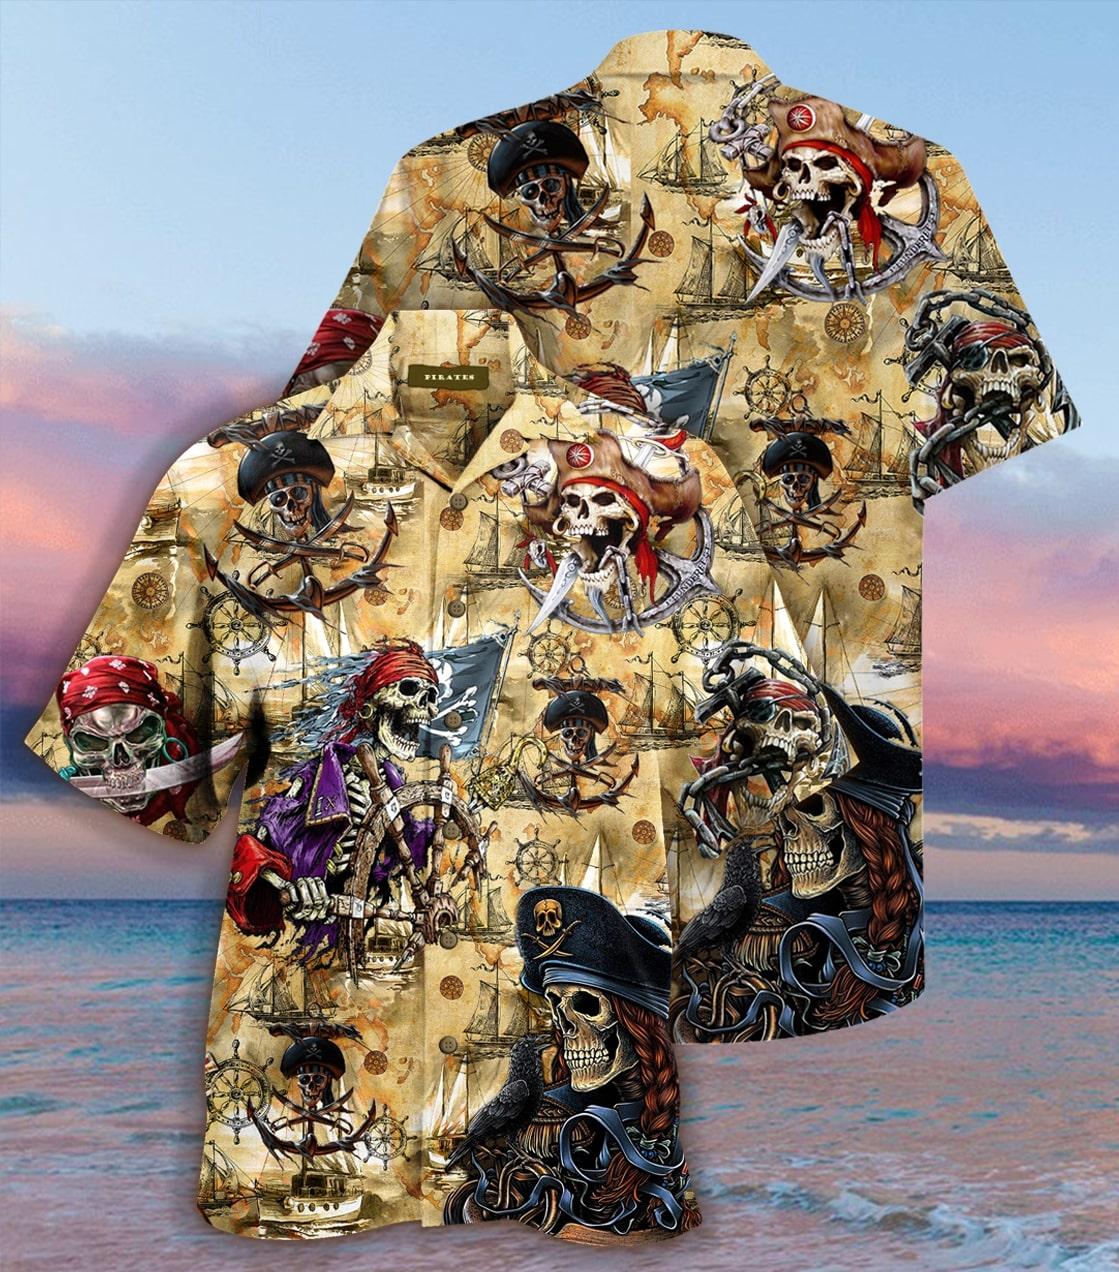 [special edition] sea map pirate skull hawaiian shirt - Maria